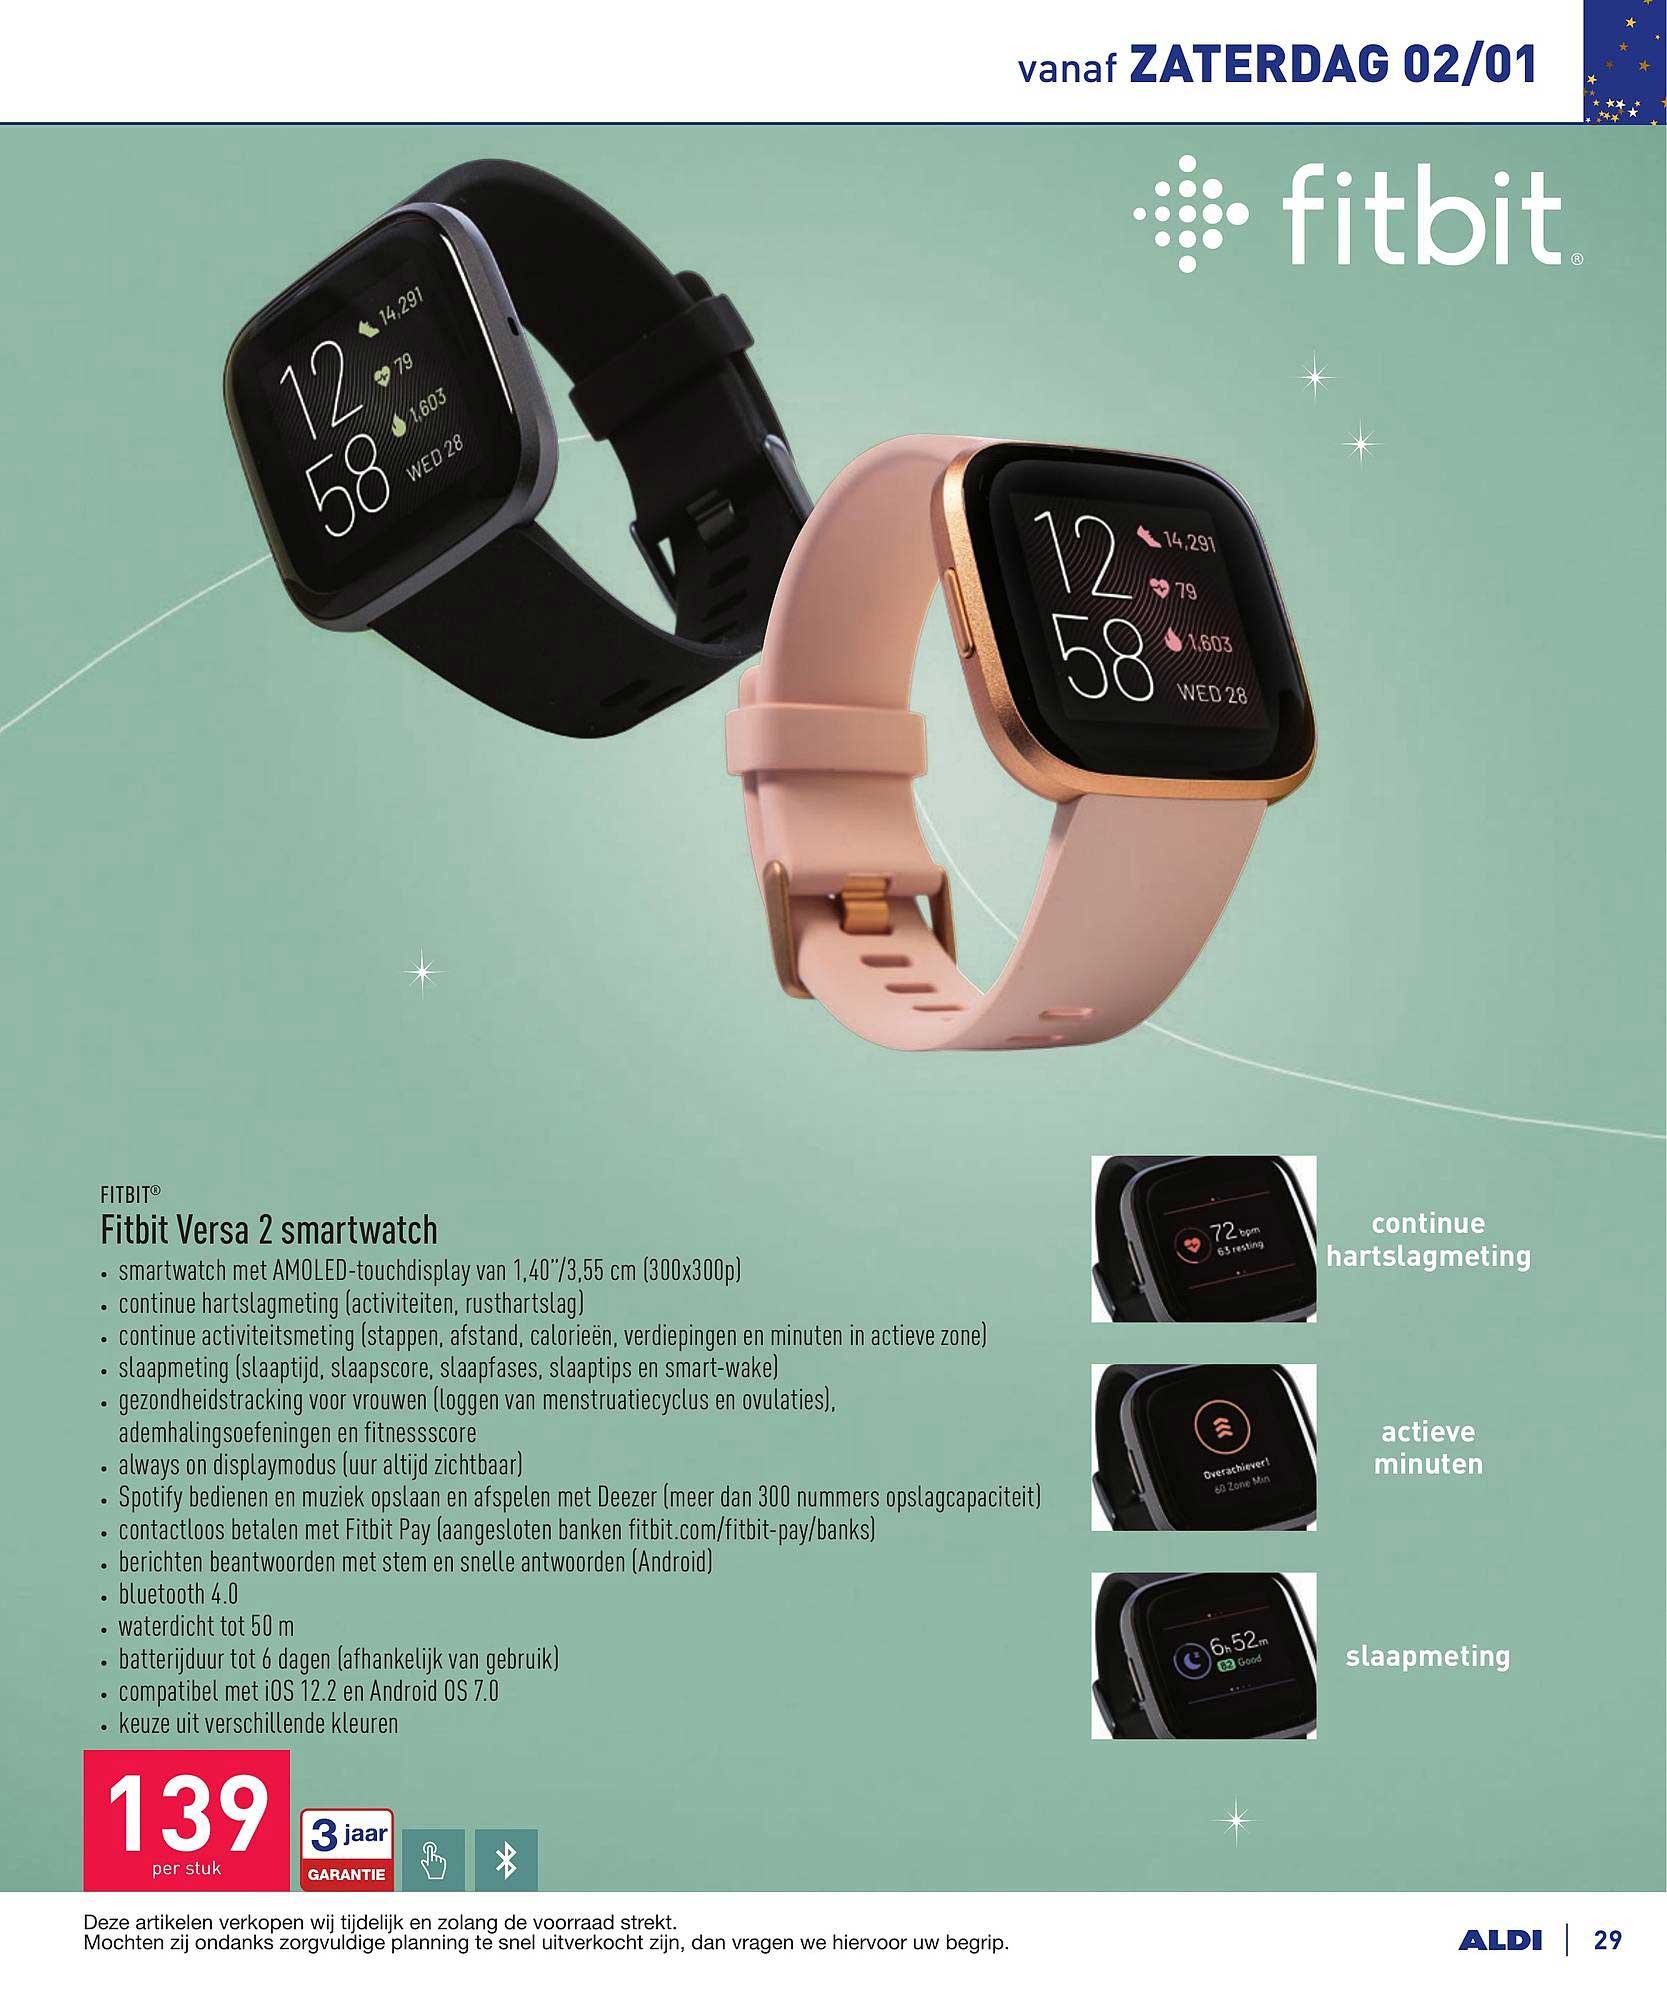 ALDI Fitbit Versa 2 Smartwatch